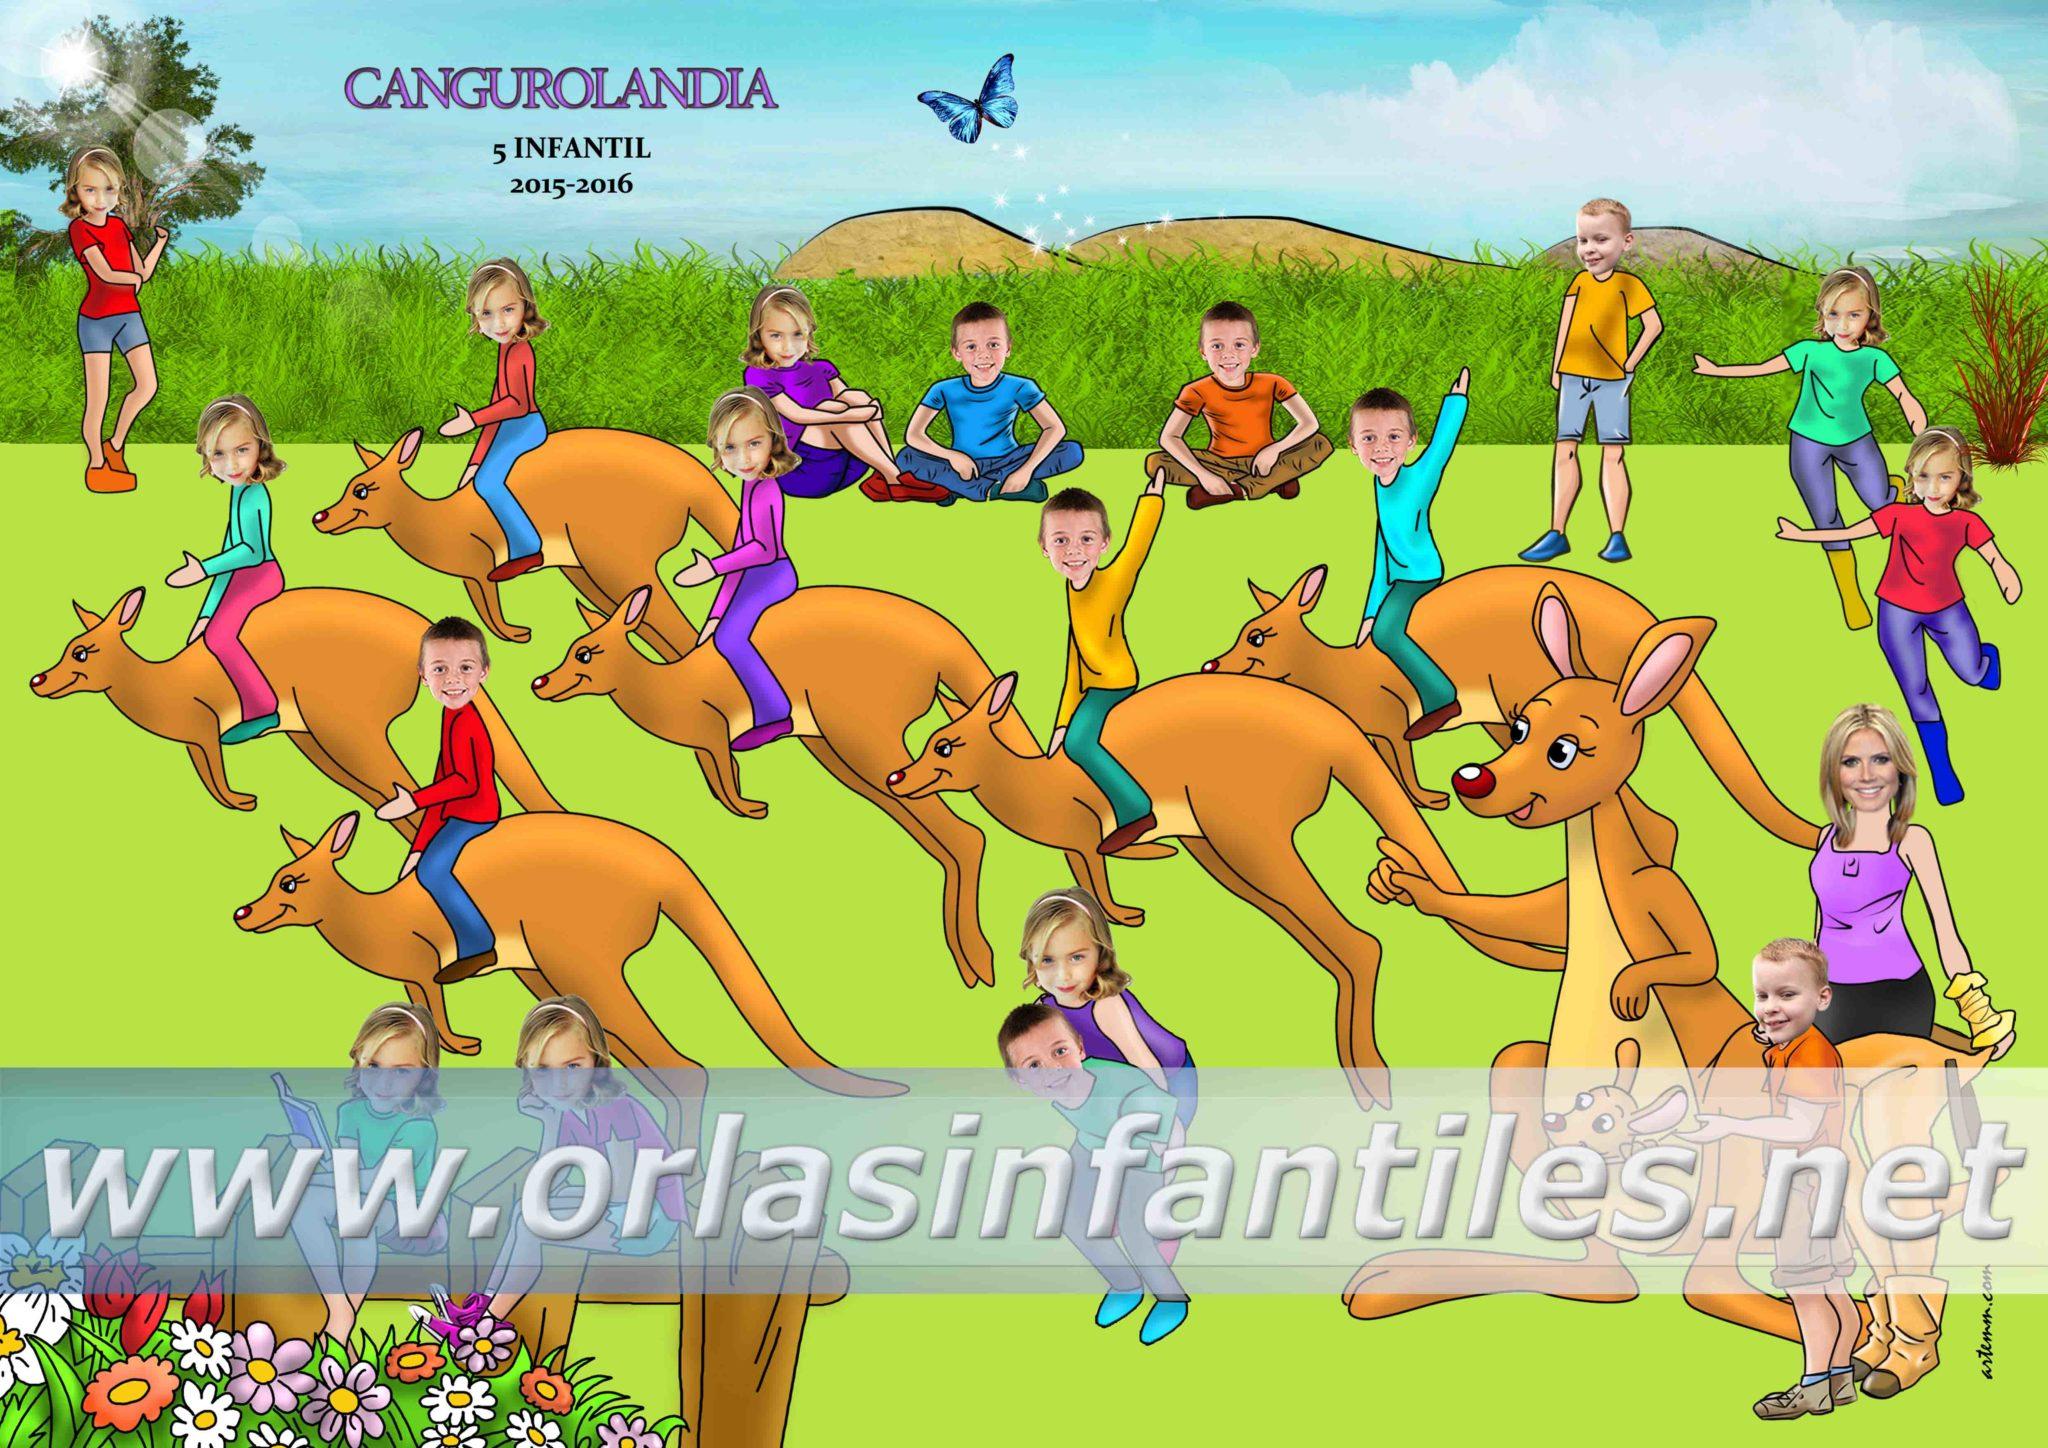 ORLA CANGUROLANDIA 2